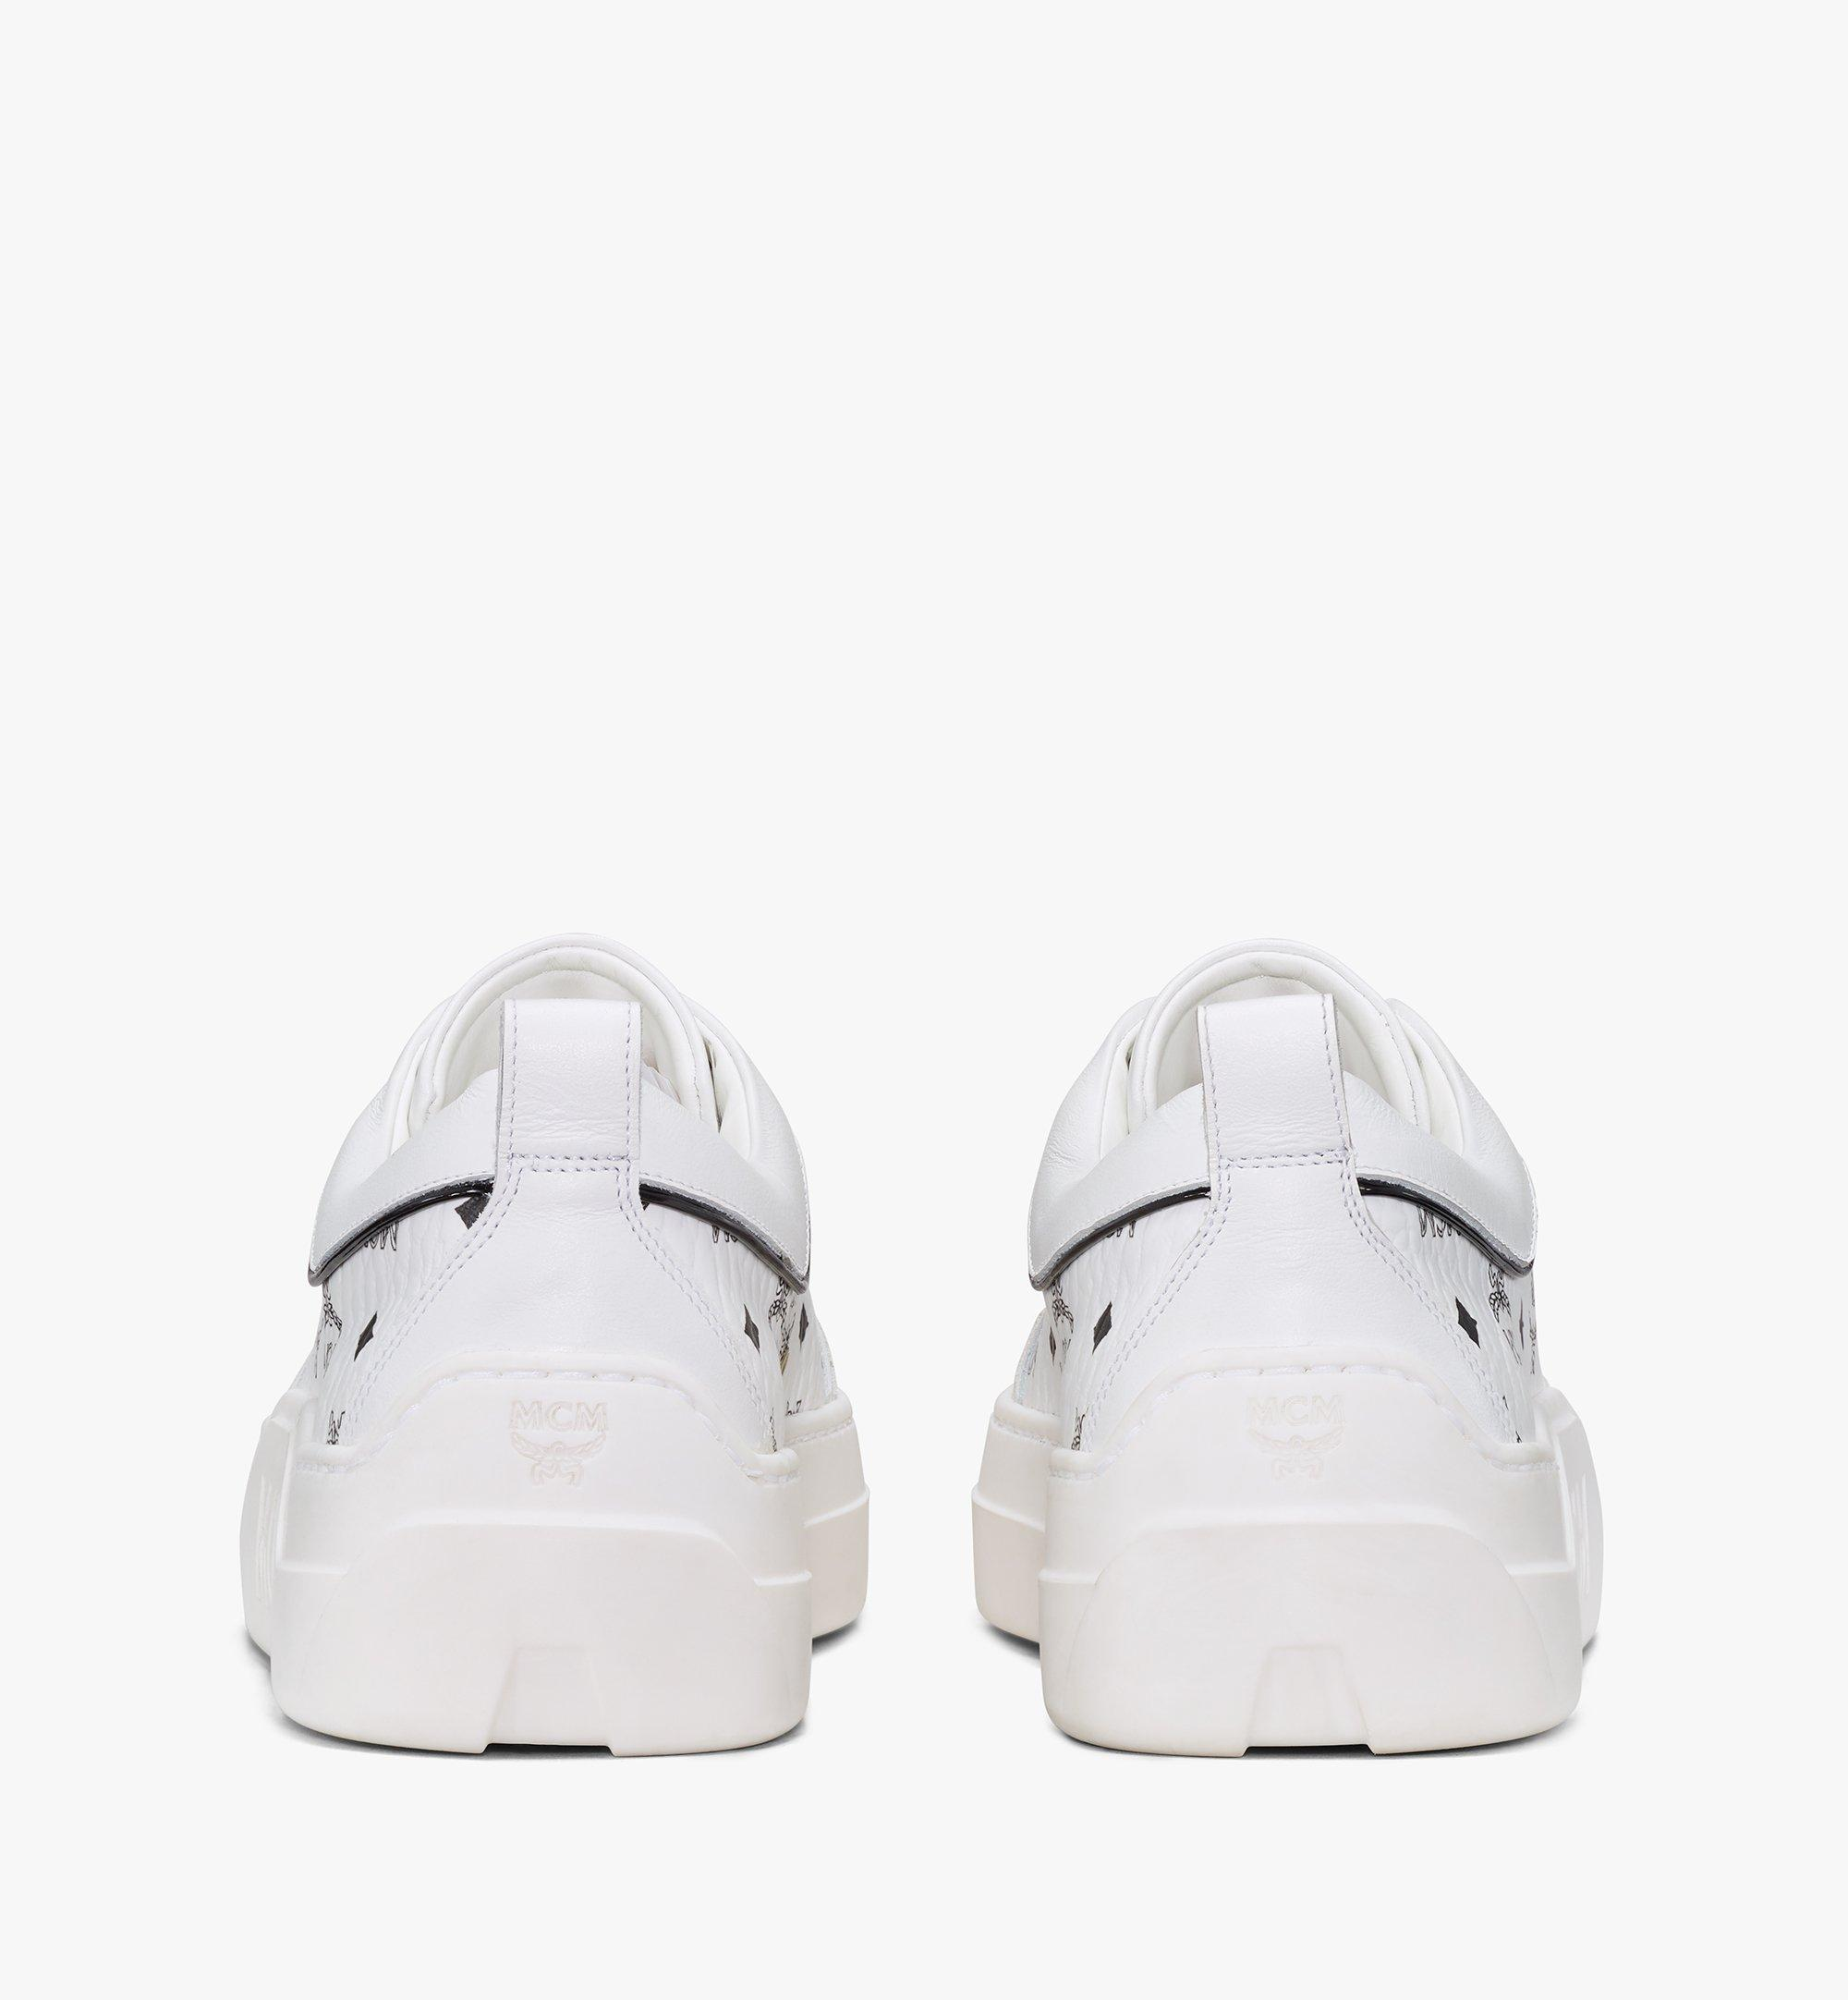 MCM Women's Skyward Platform Sneakers in Visetos White MESAAMM19WT037 Alternate View 2